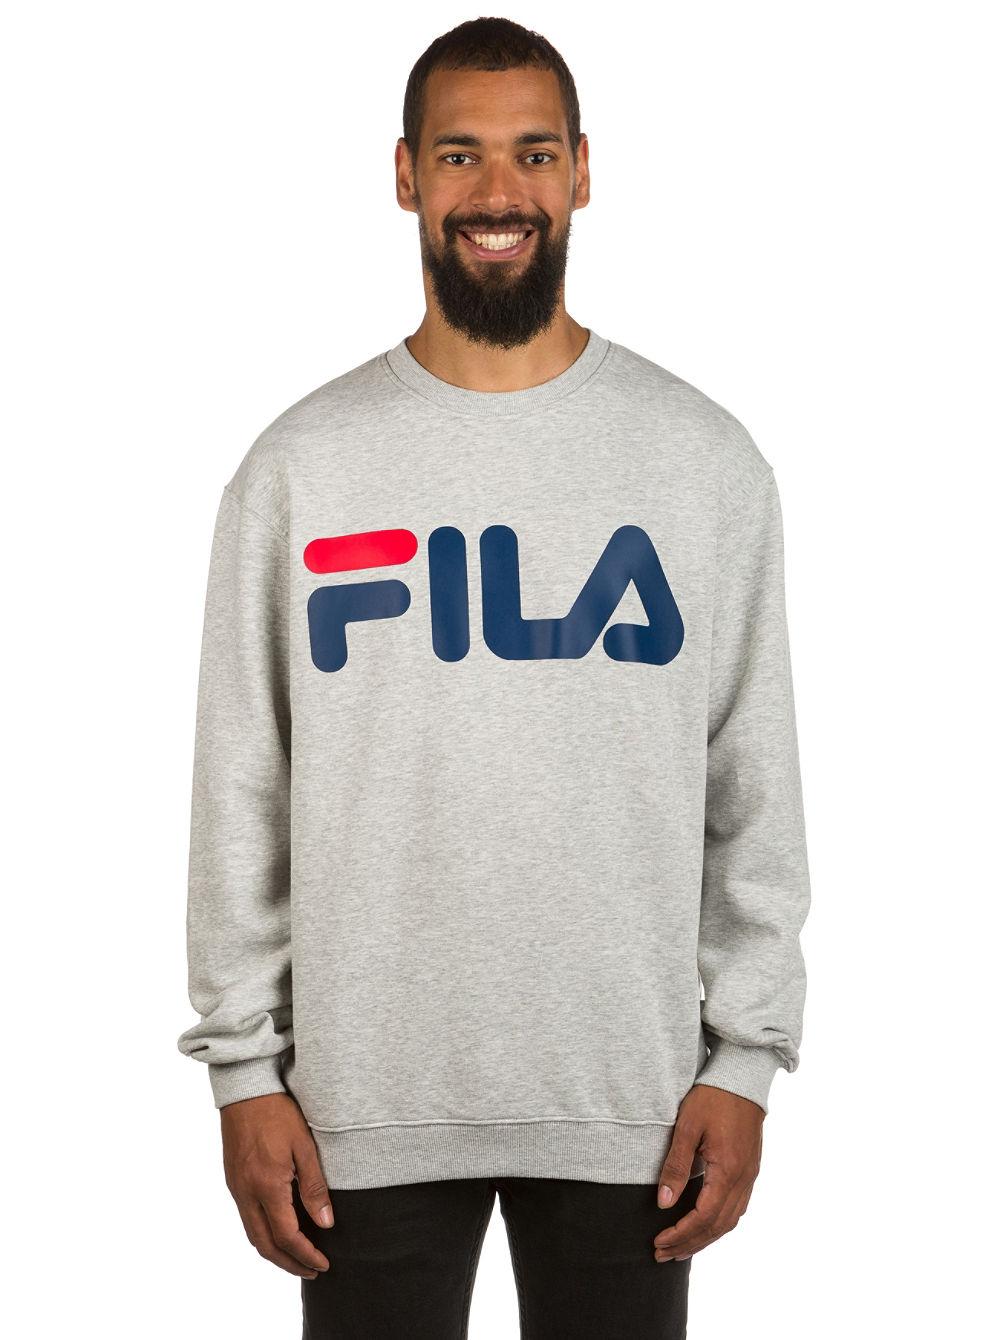 902761ef7ec1 Buy Fila Basic Sweater online at Blue Tomato